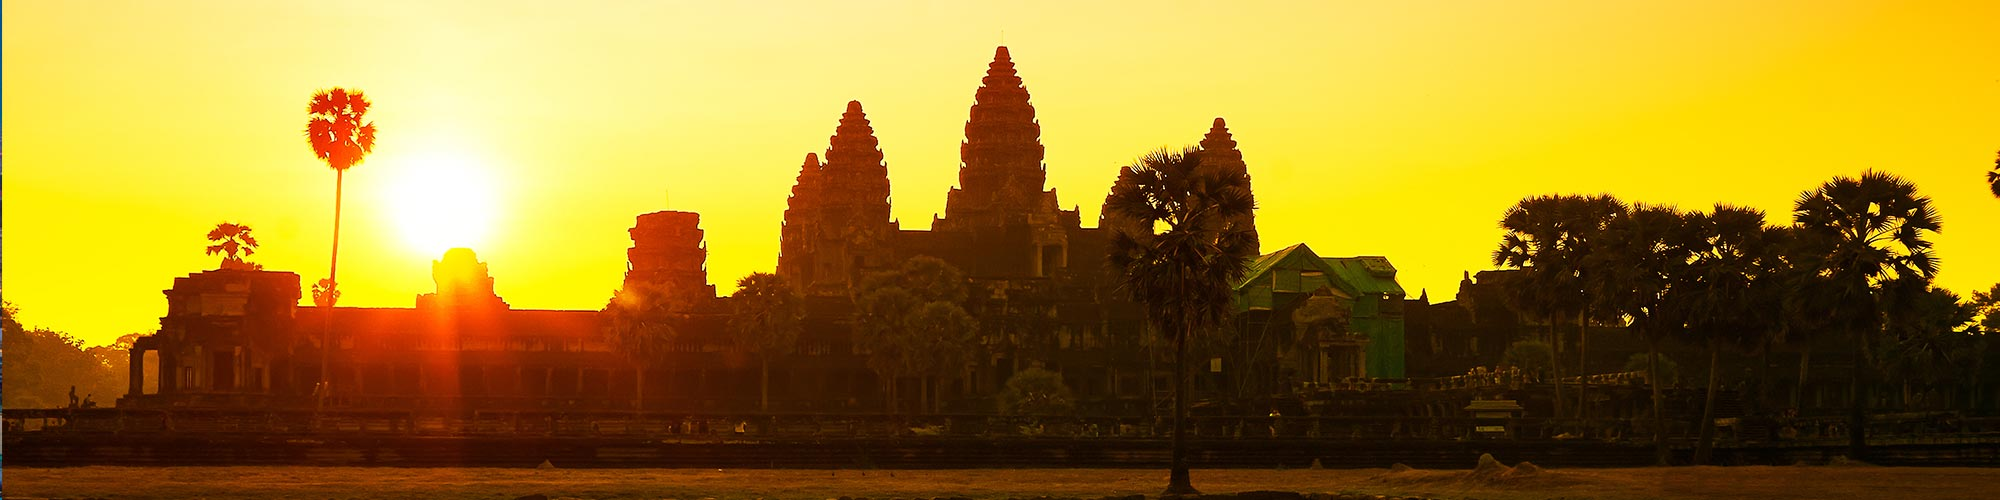 Laos, Camboya y Vietnam a través del Mekong - EL PAIS Viajes